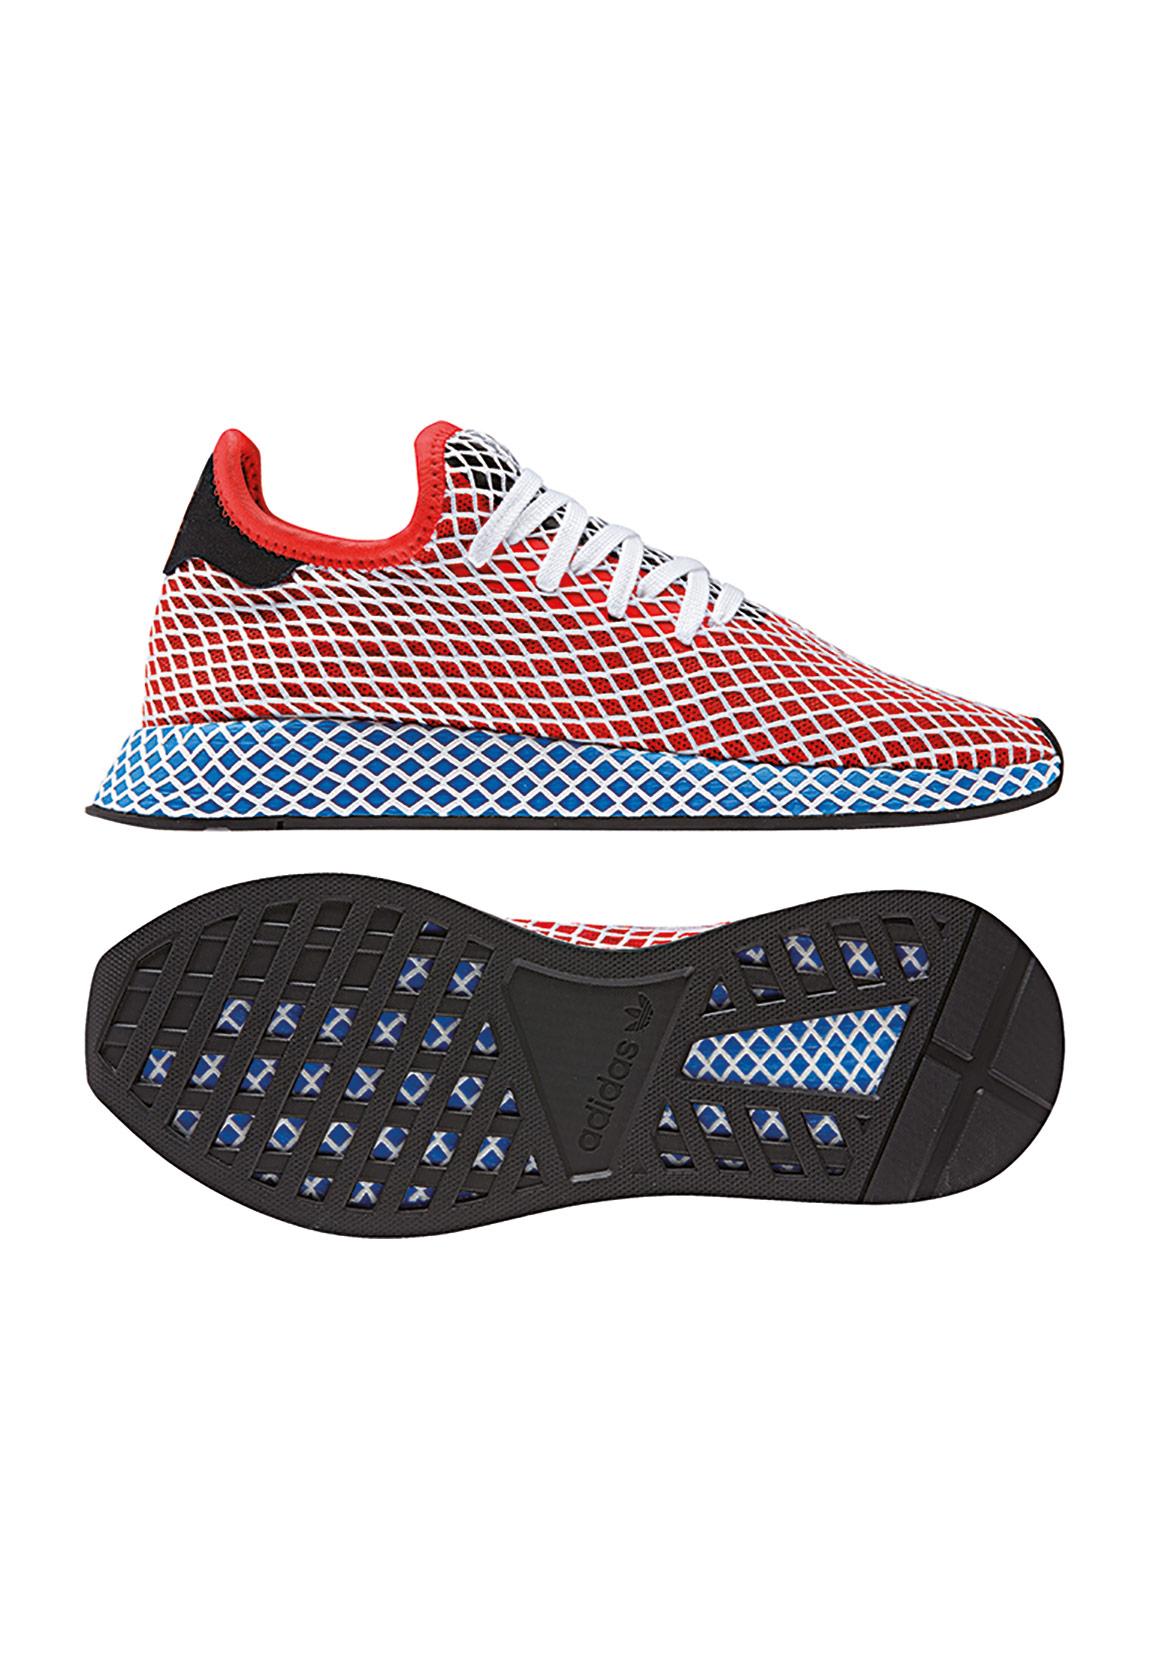 half off ecf30 eb3e2 Adidas Originals Sneaker DEERUPT RUNNER CQ2624 Rot Blau